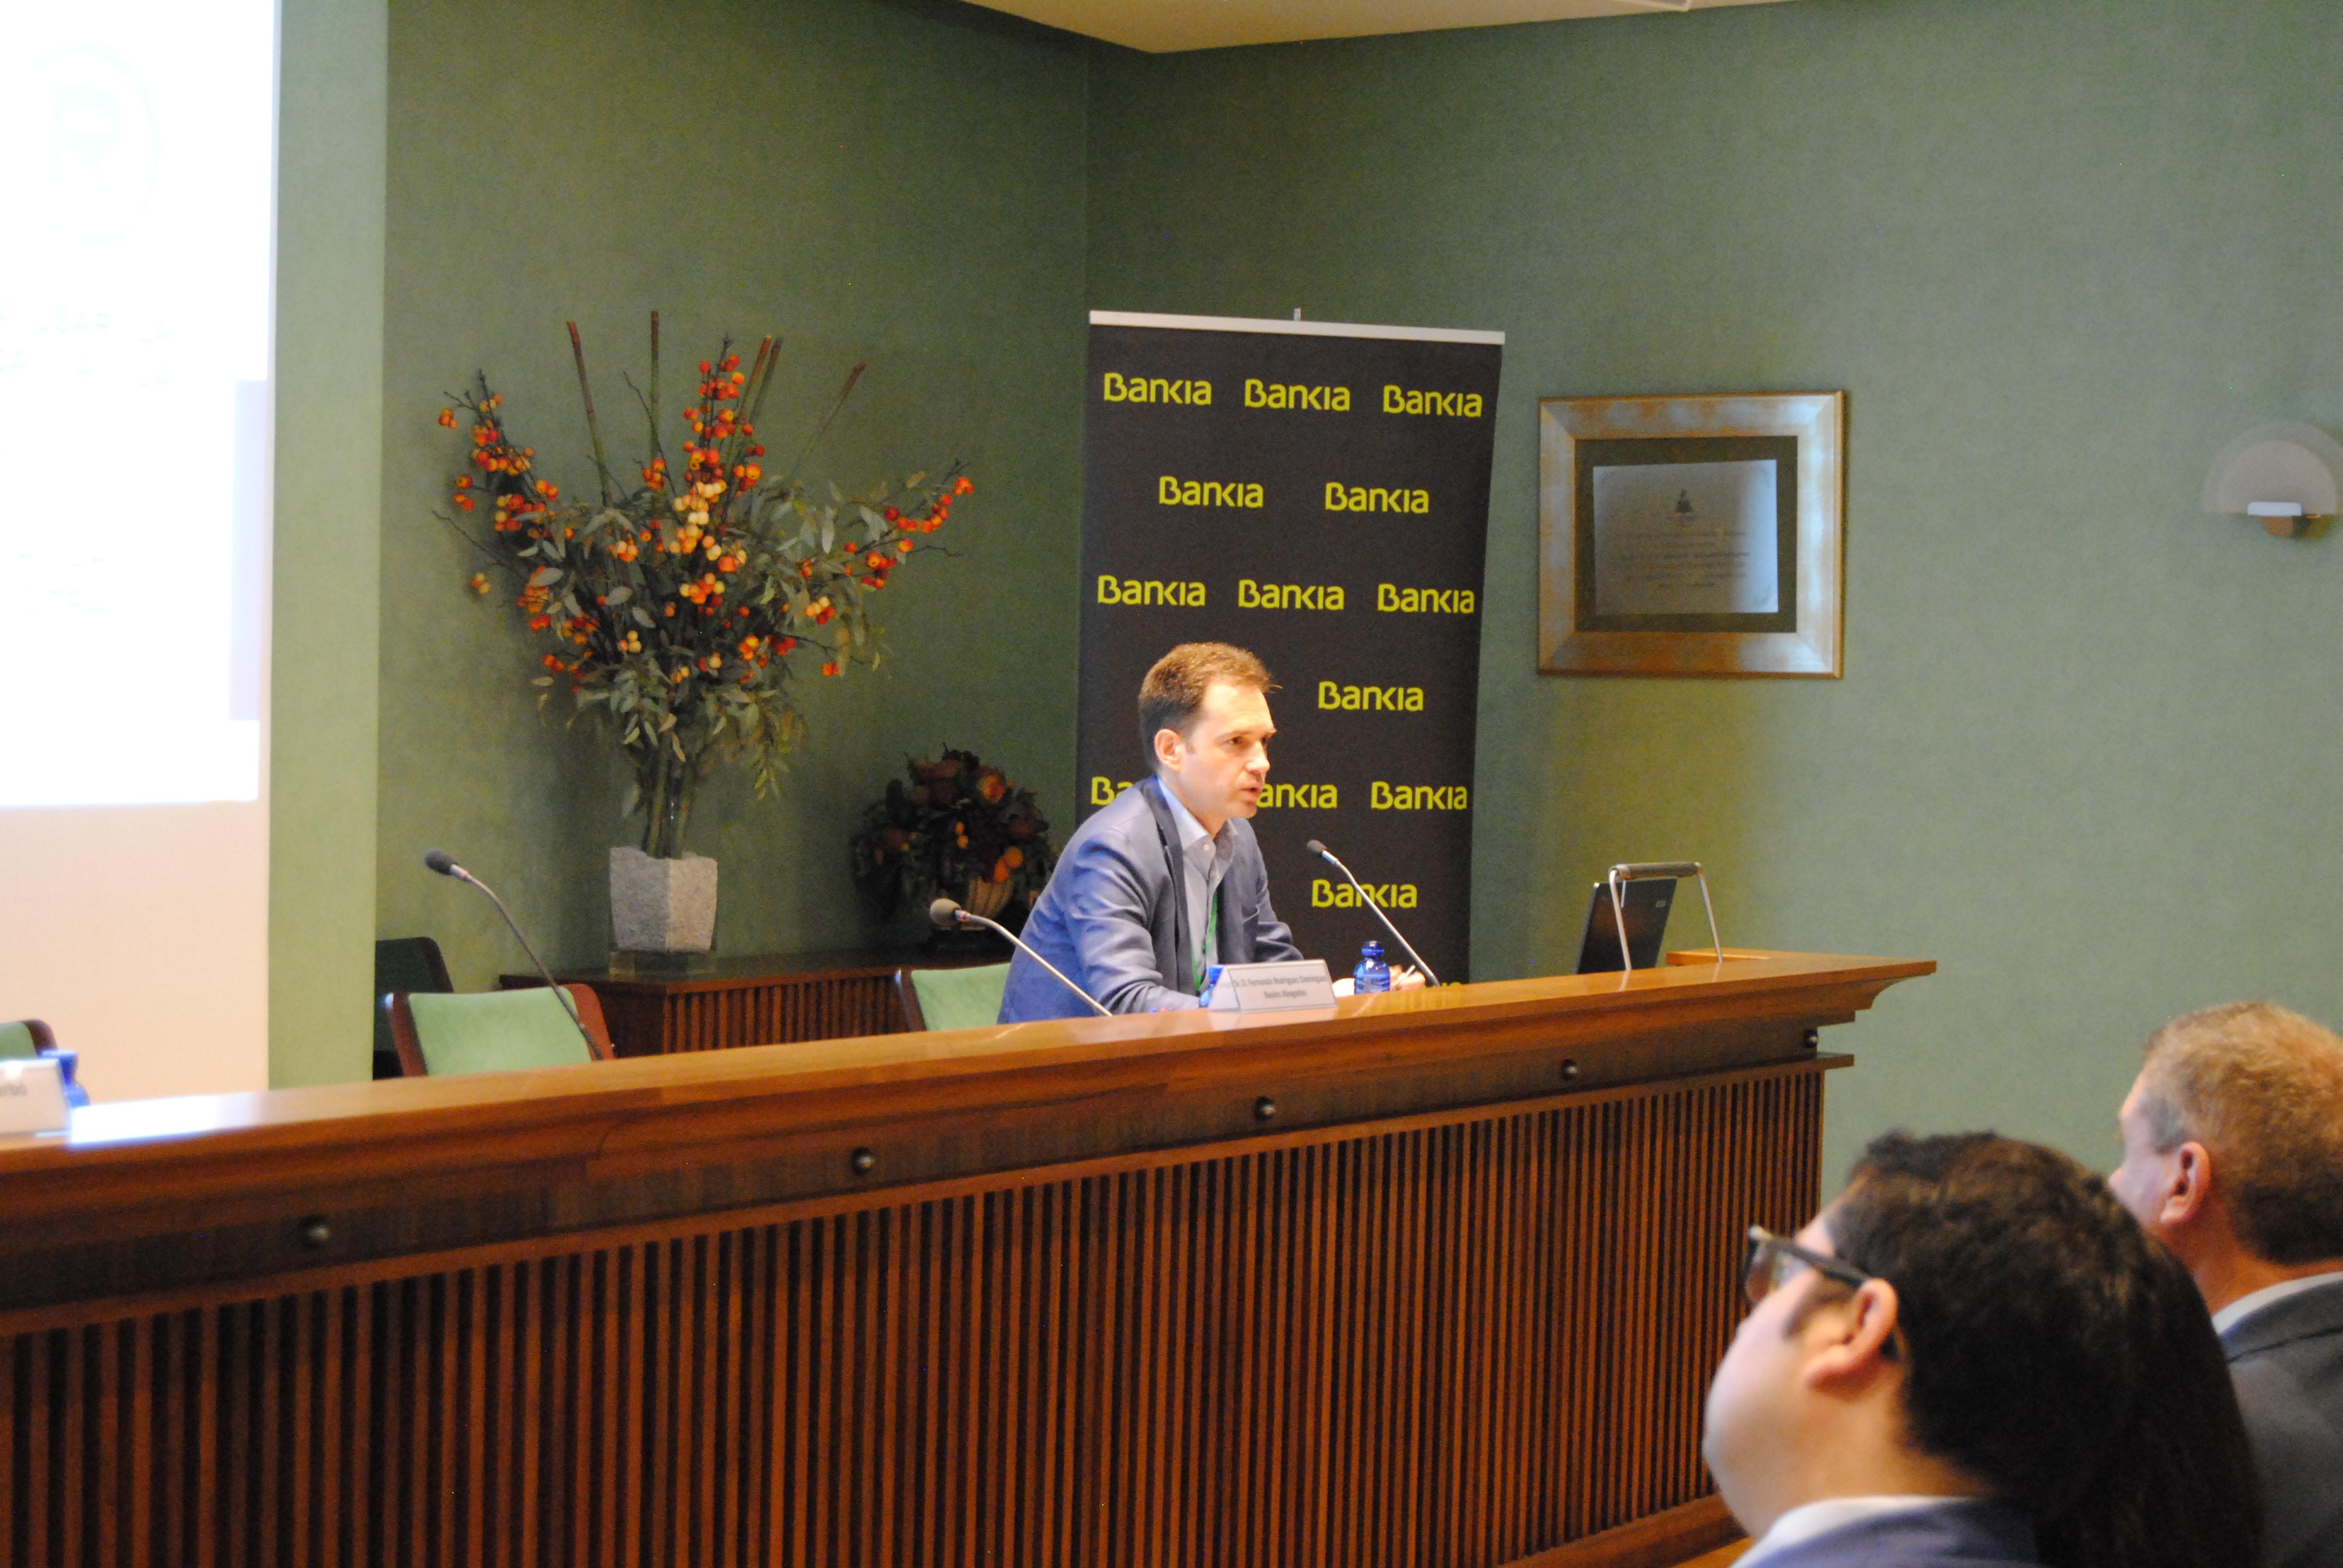 Fernando Rodríguez Domínguez, abogado del despacho Baylos